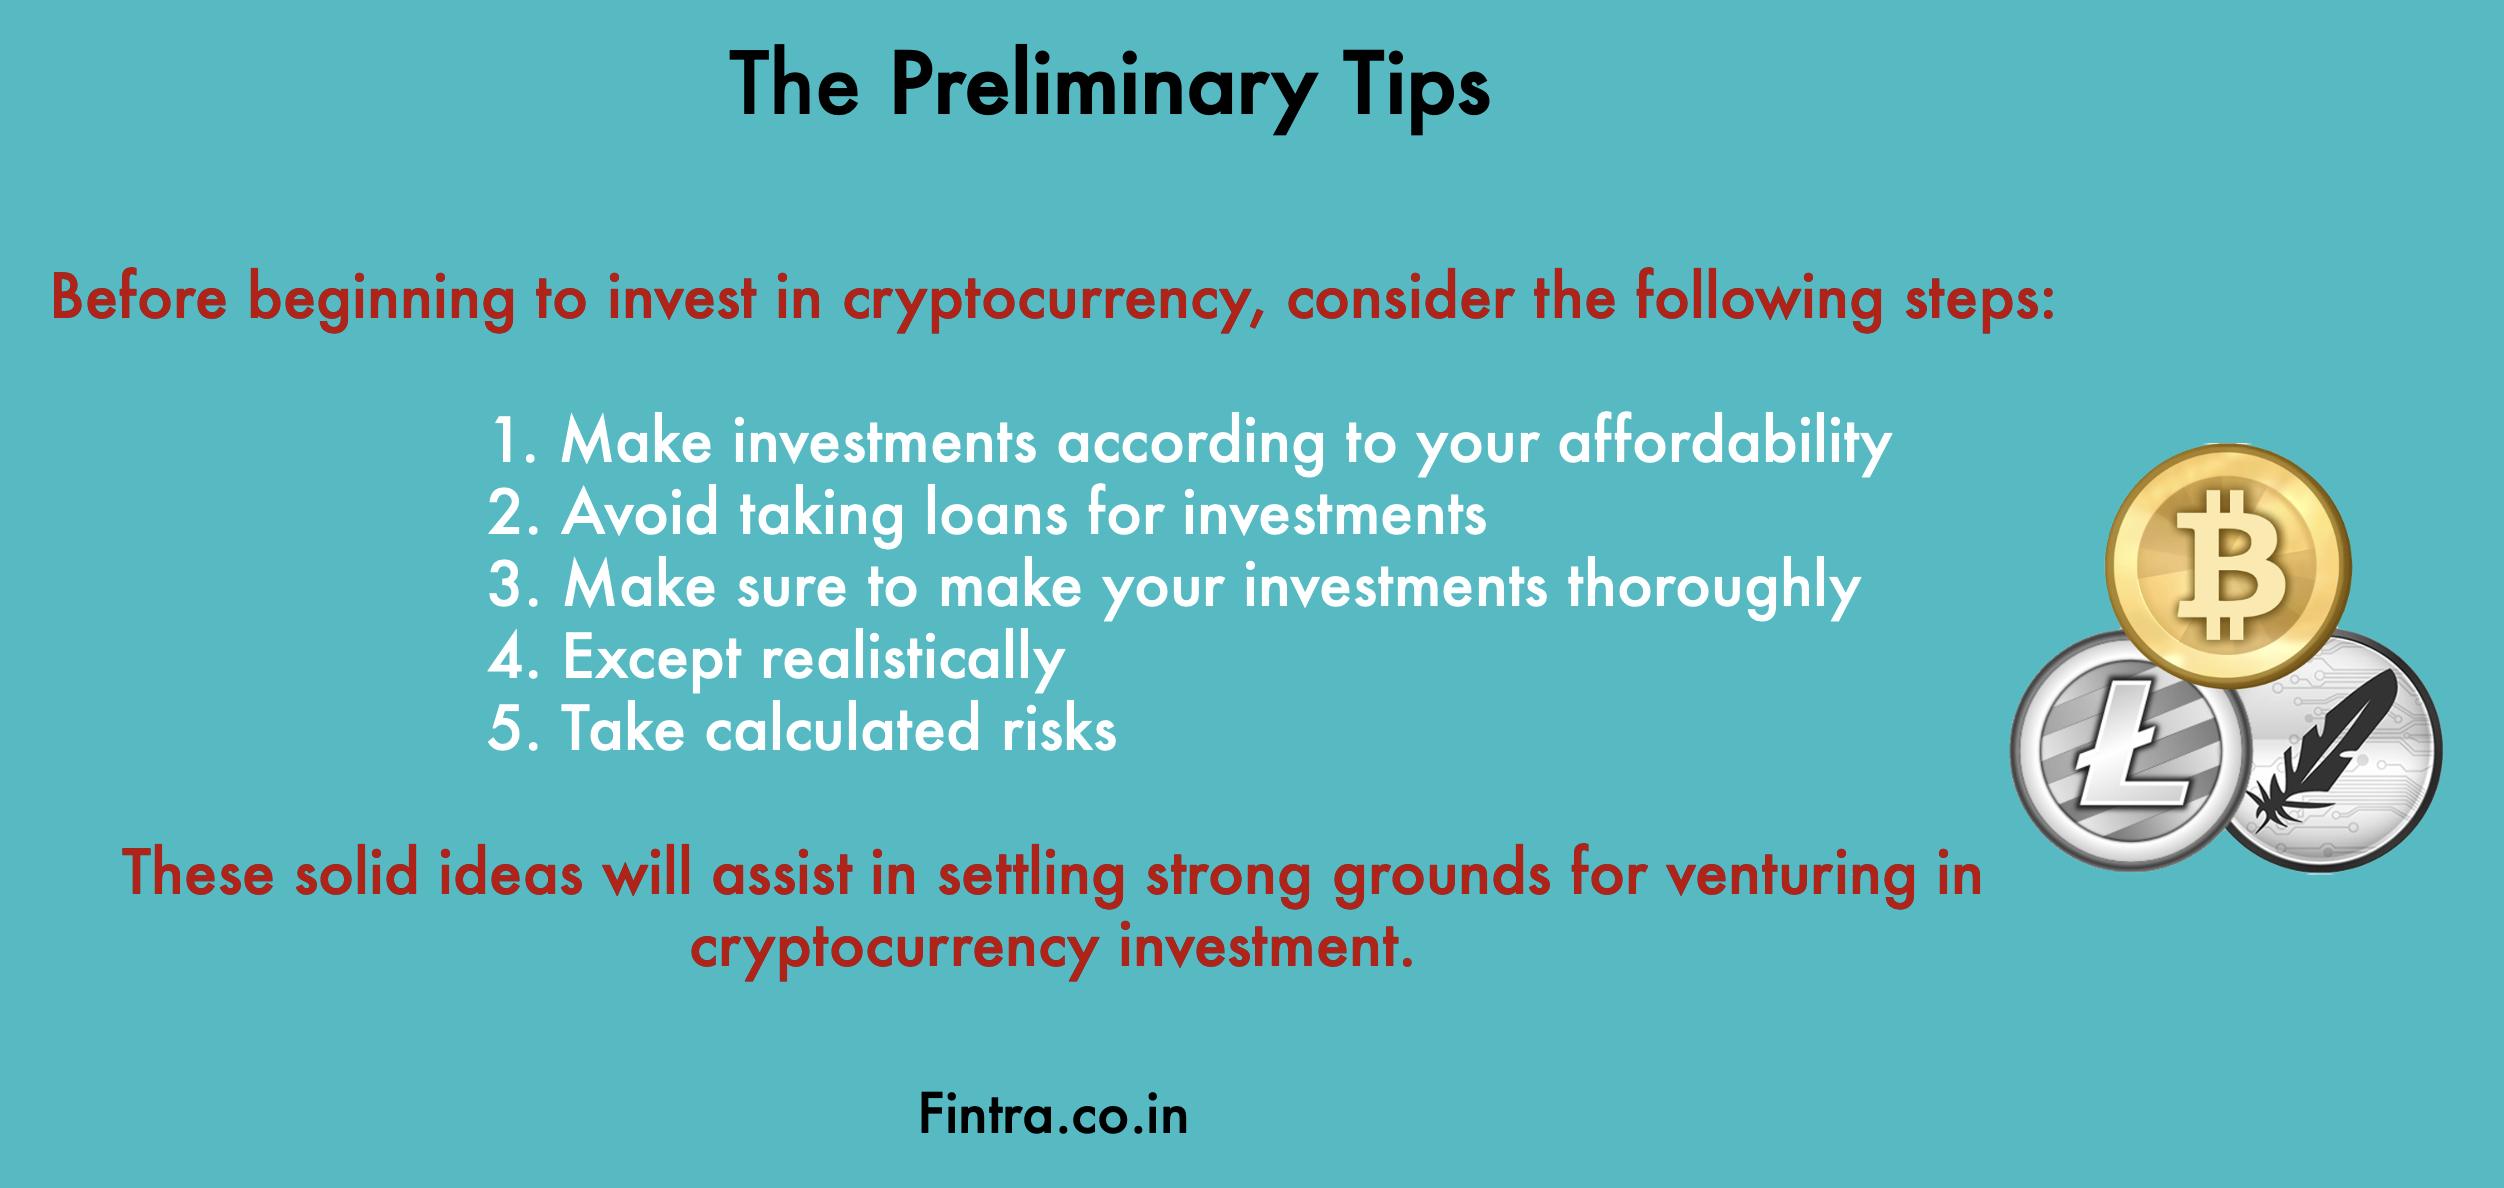 the preliminary tips